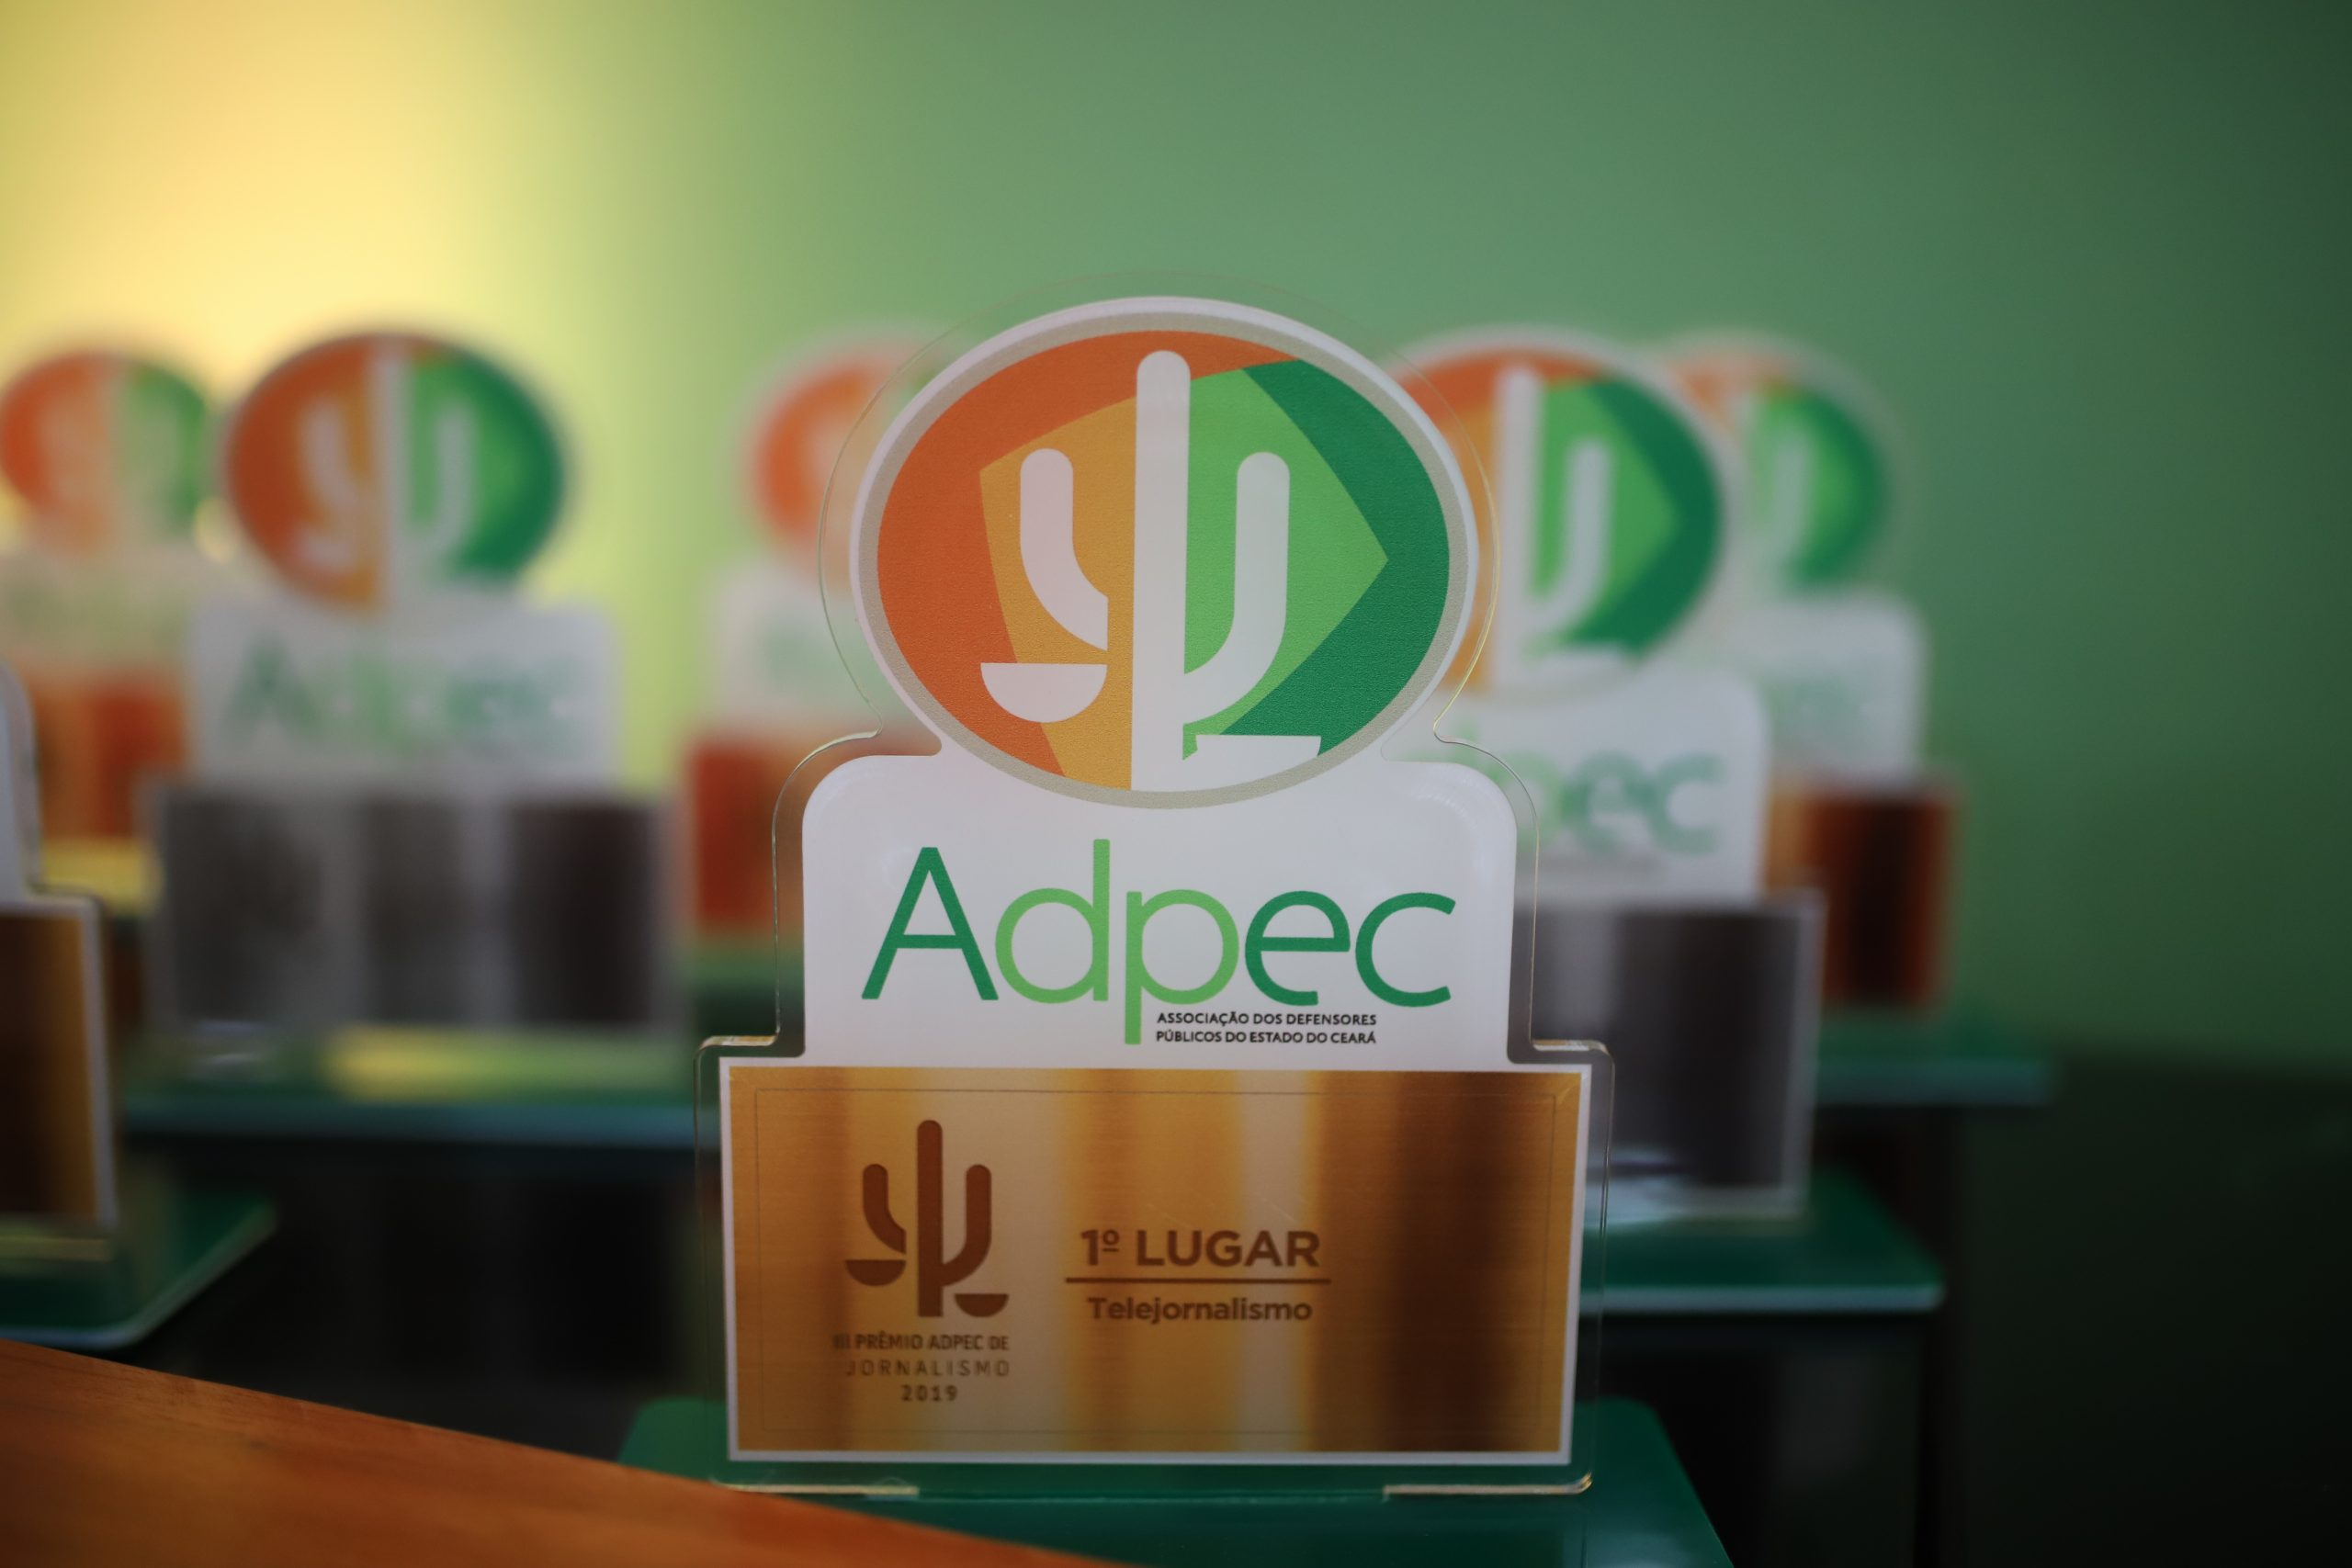 III Prêmio Adpec de Jornalismo